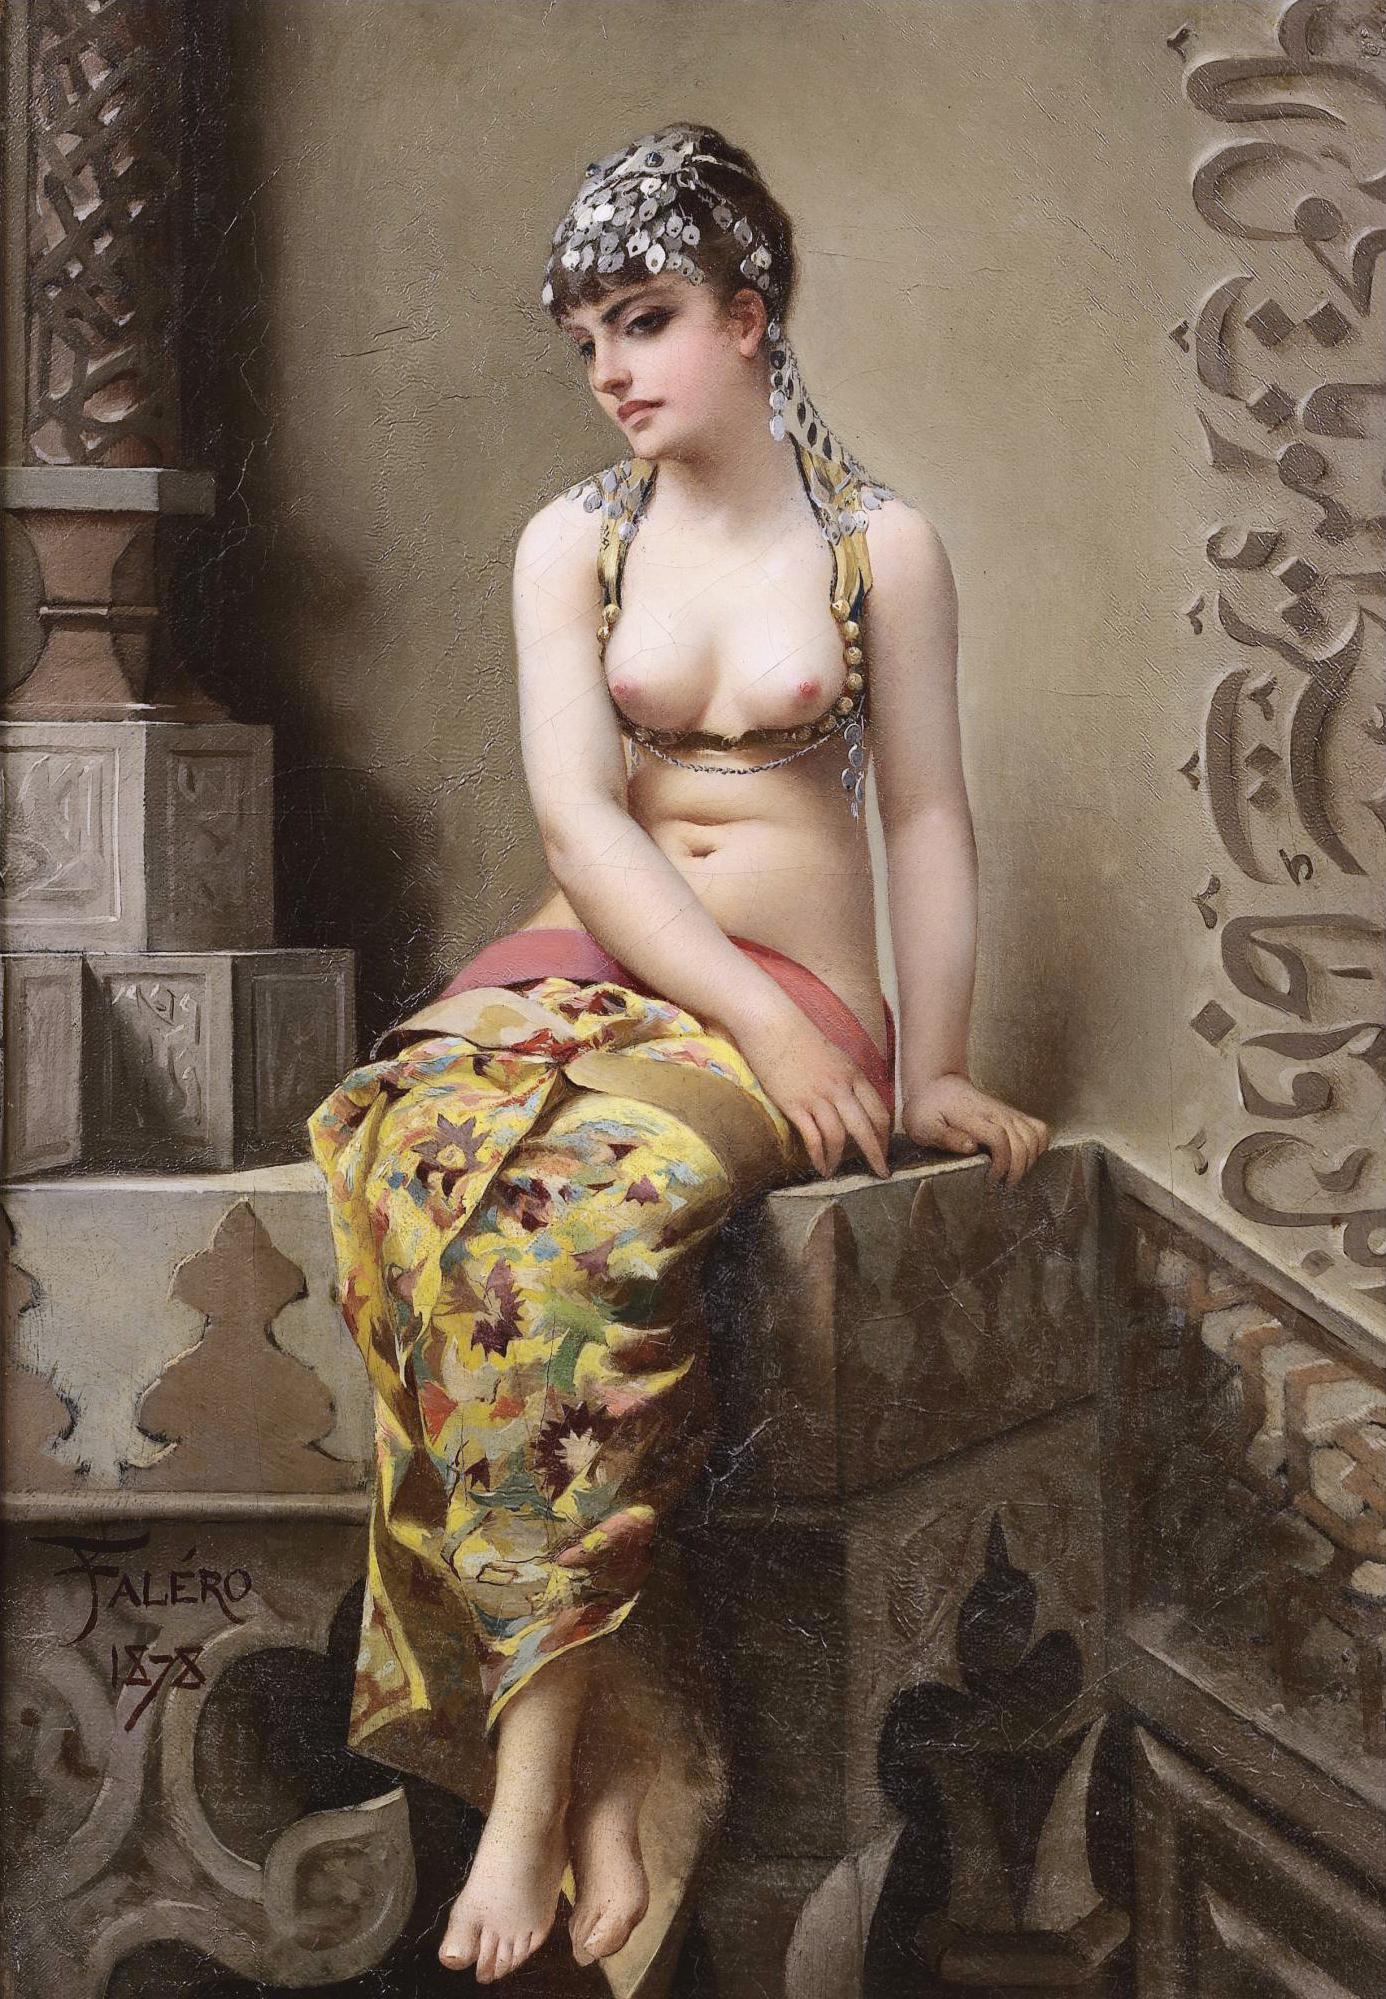 Luis Ricardo Falero, 1851-1896. Чаровница. 1878. 27.3 х 19.5 см. Частная коллекция